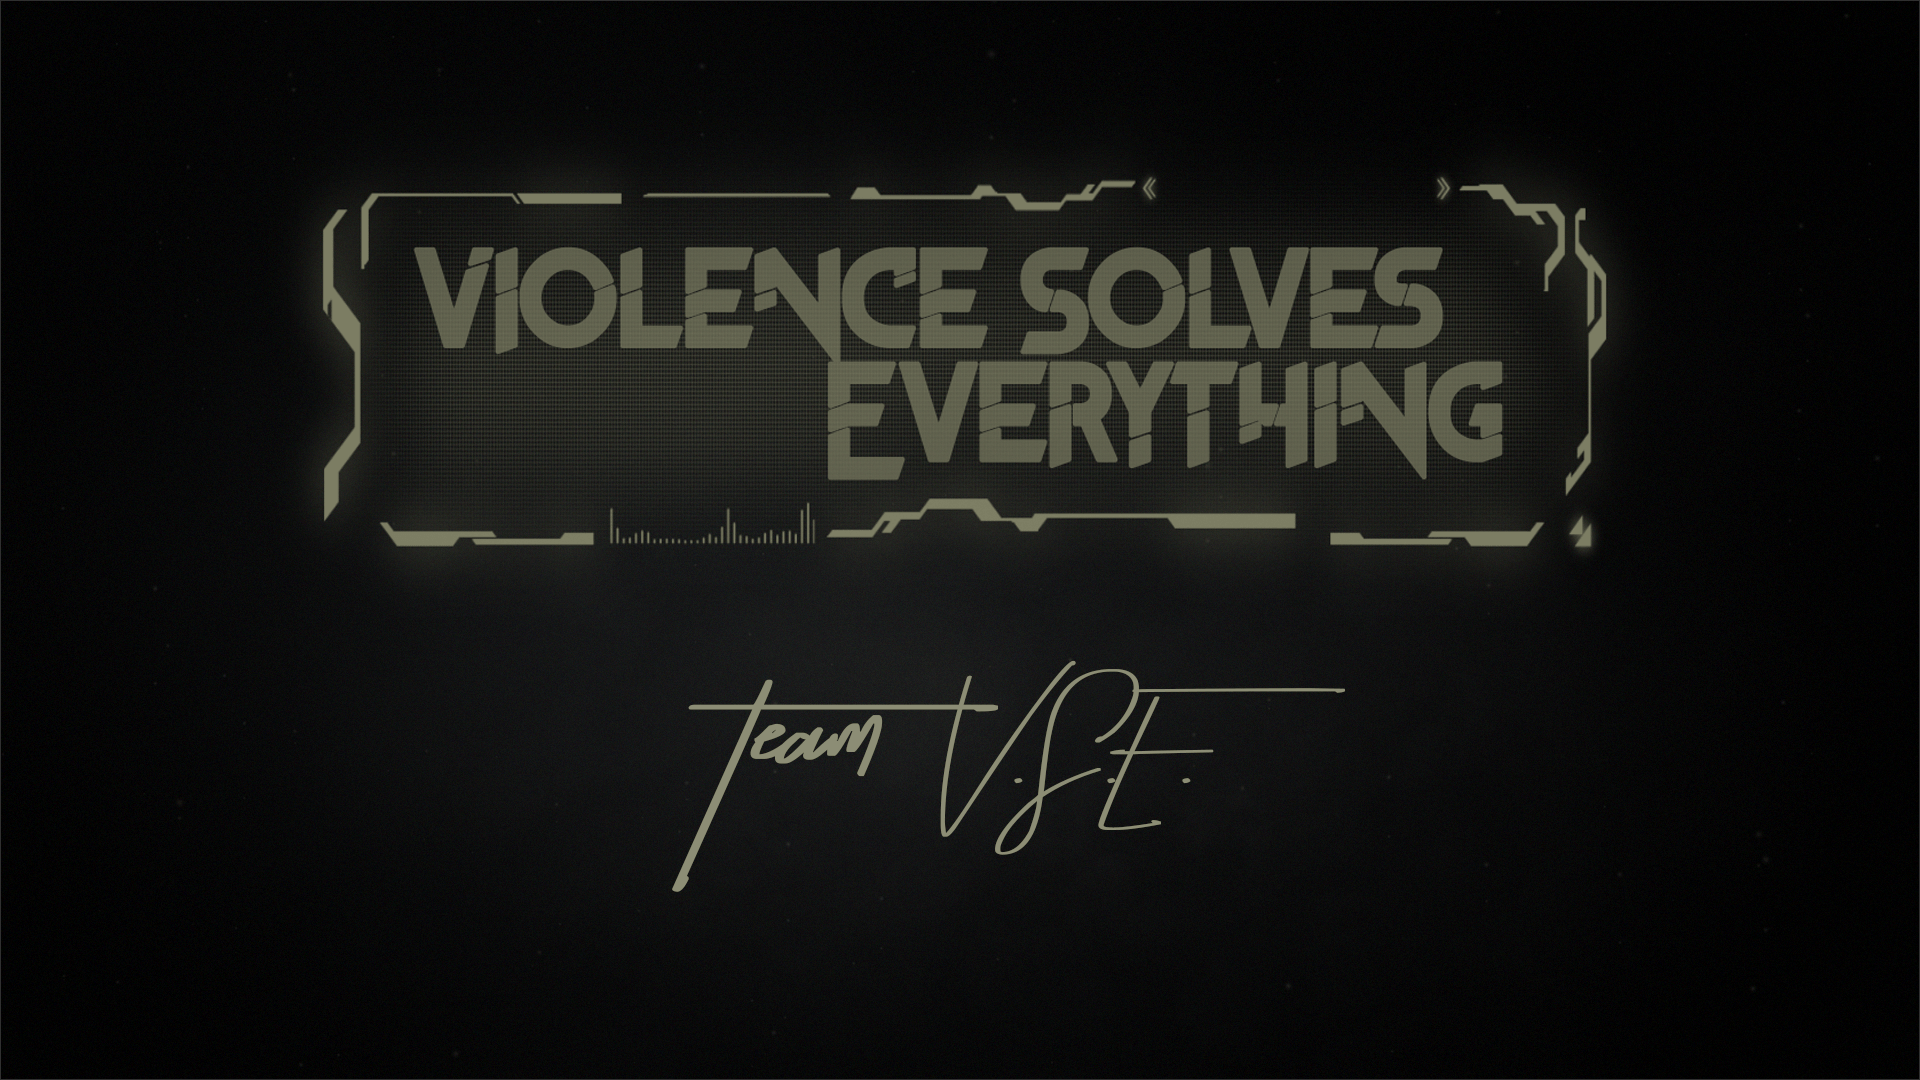 Violence Solves Everything